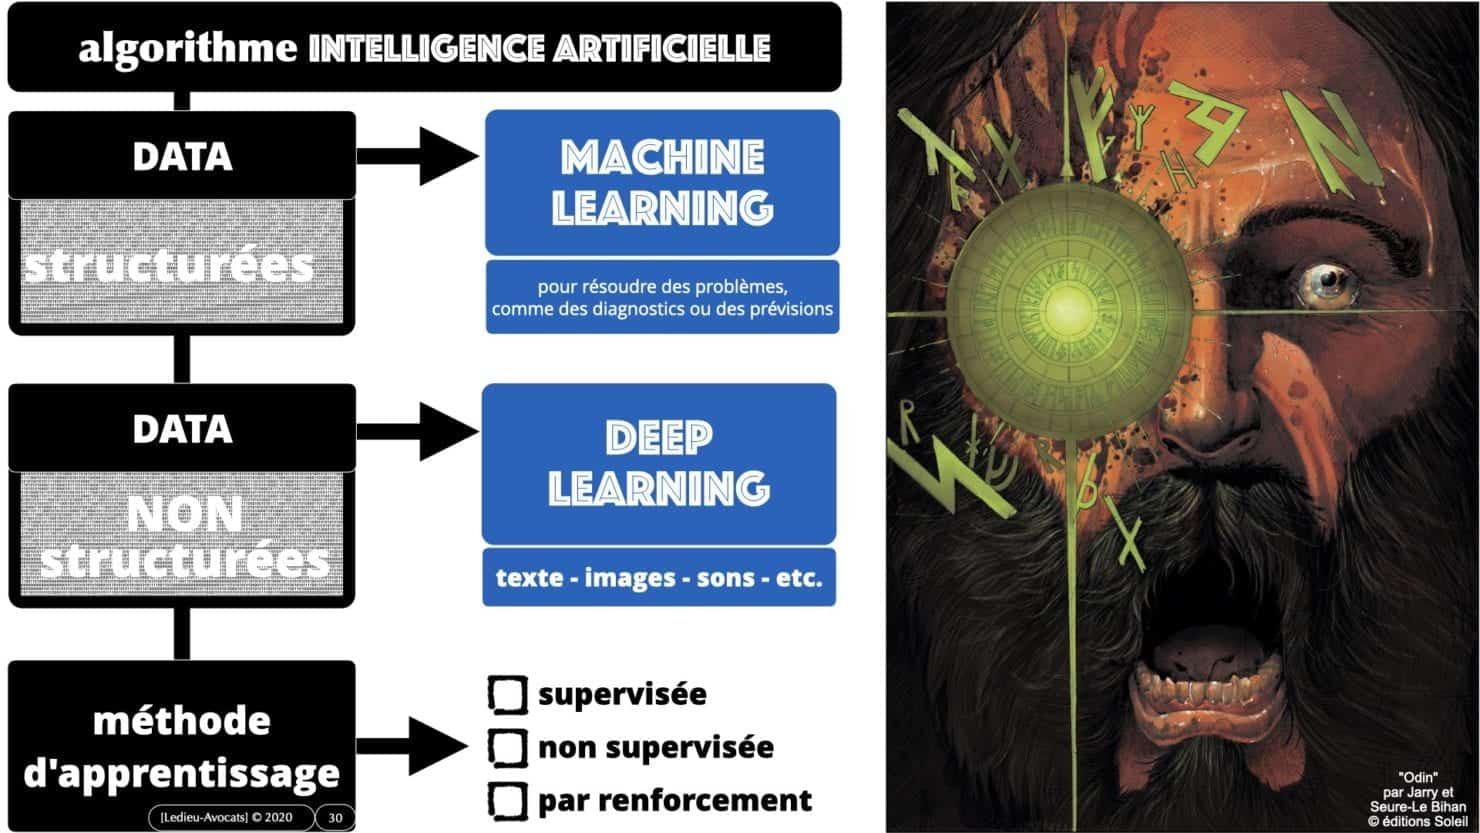 machine learning deep learning Intelligence artificielle